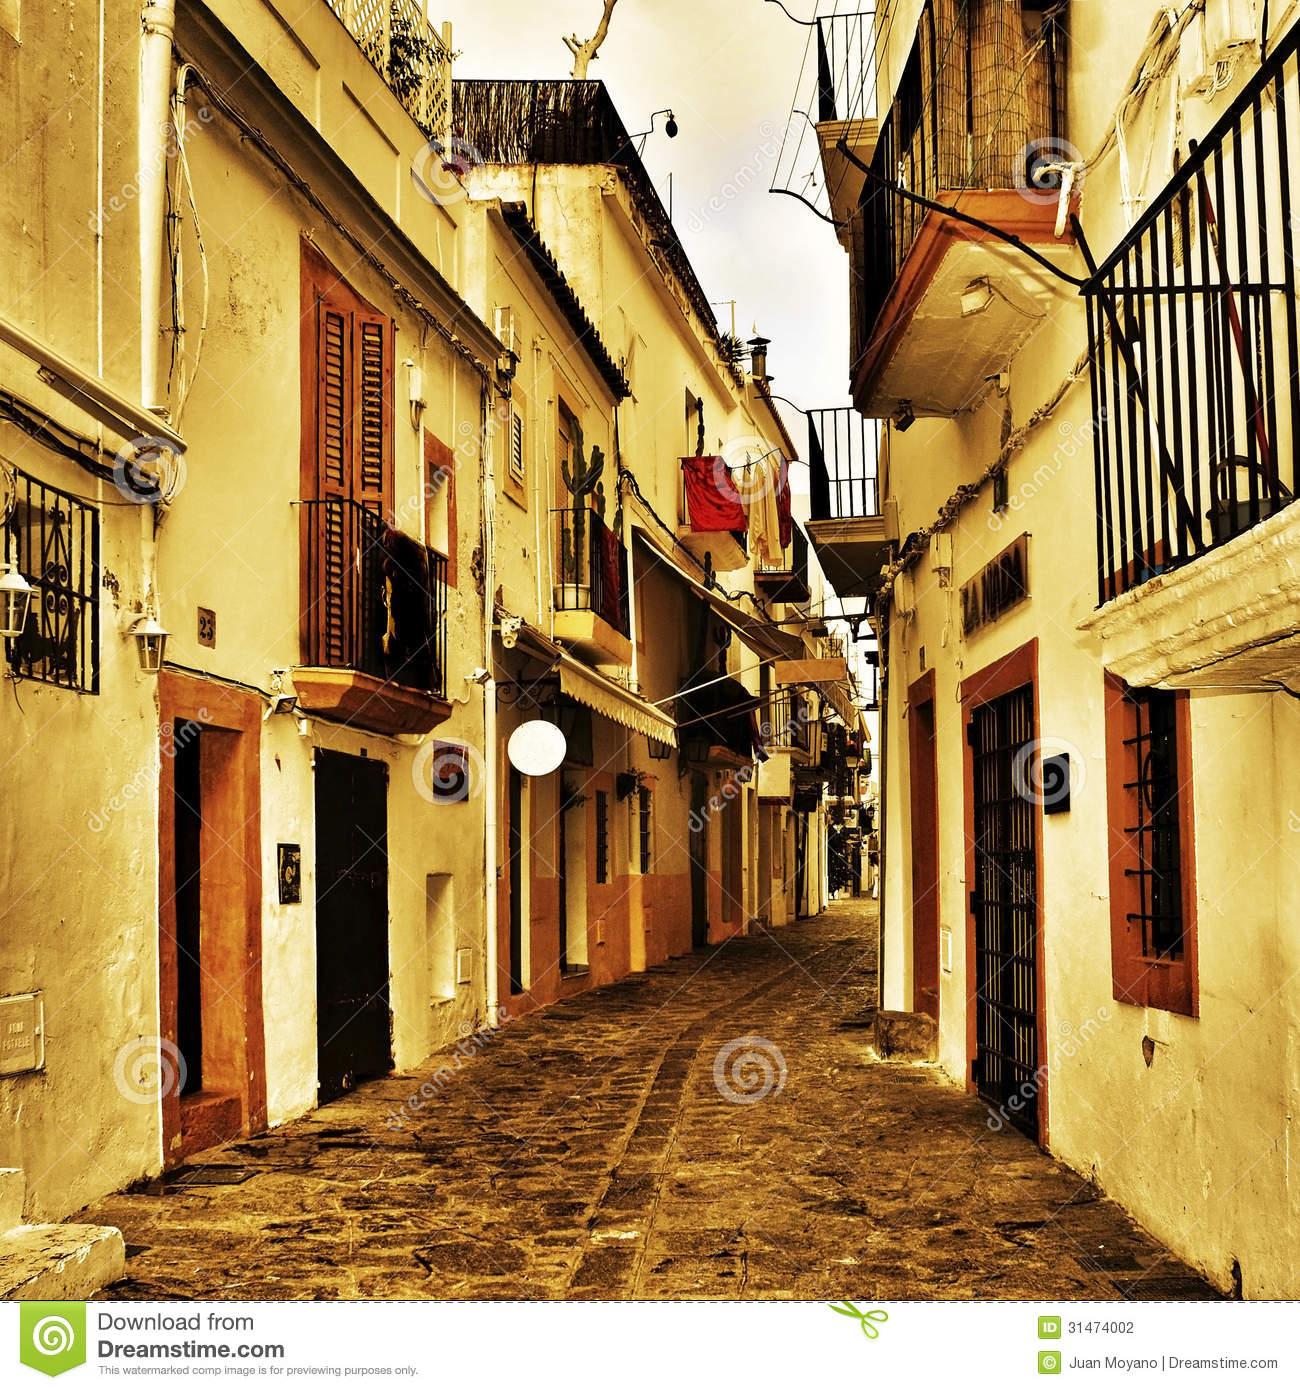 Street Of Dalt Vila, The Old Town Of Ibiza Town, In Balearic Isl.